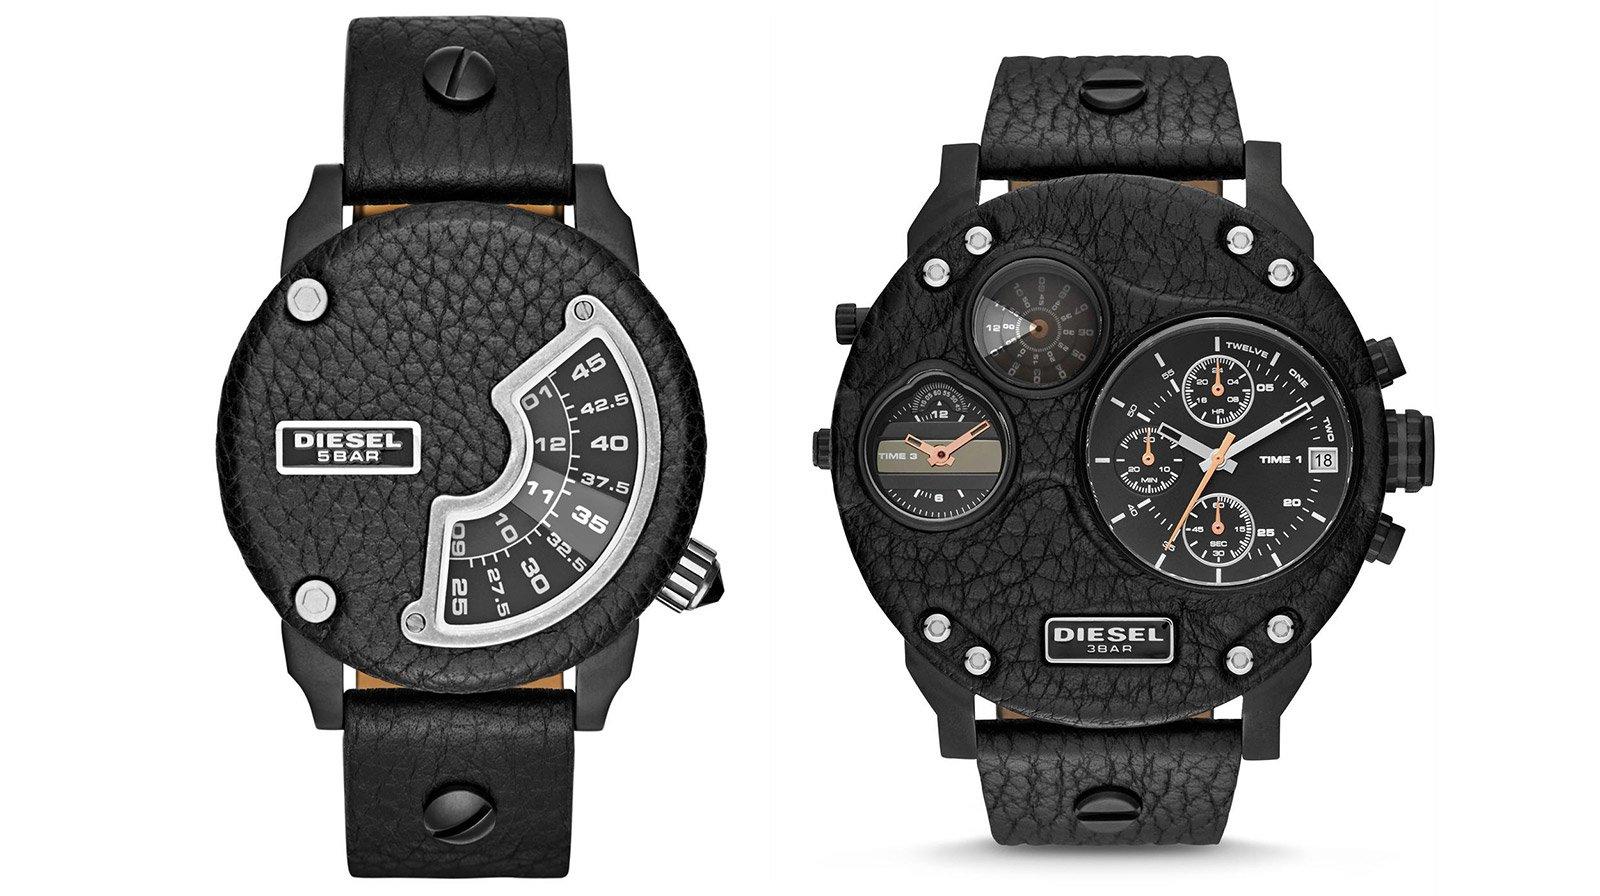 Diesel Leatherface Biker Watches